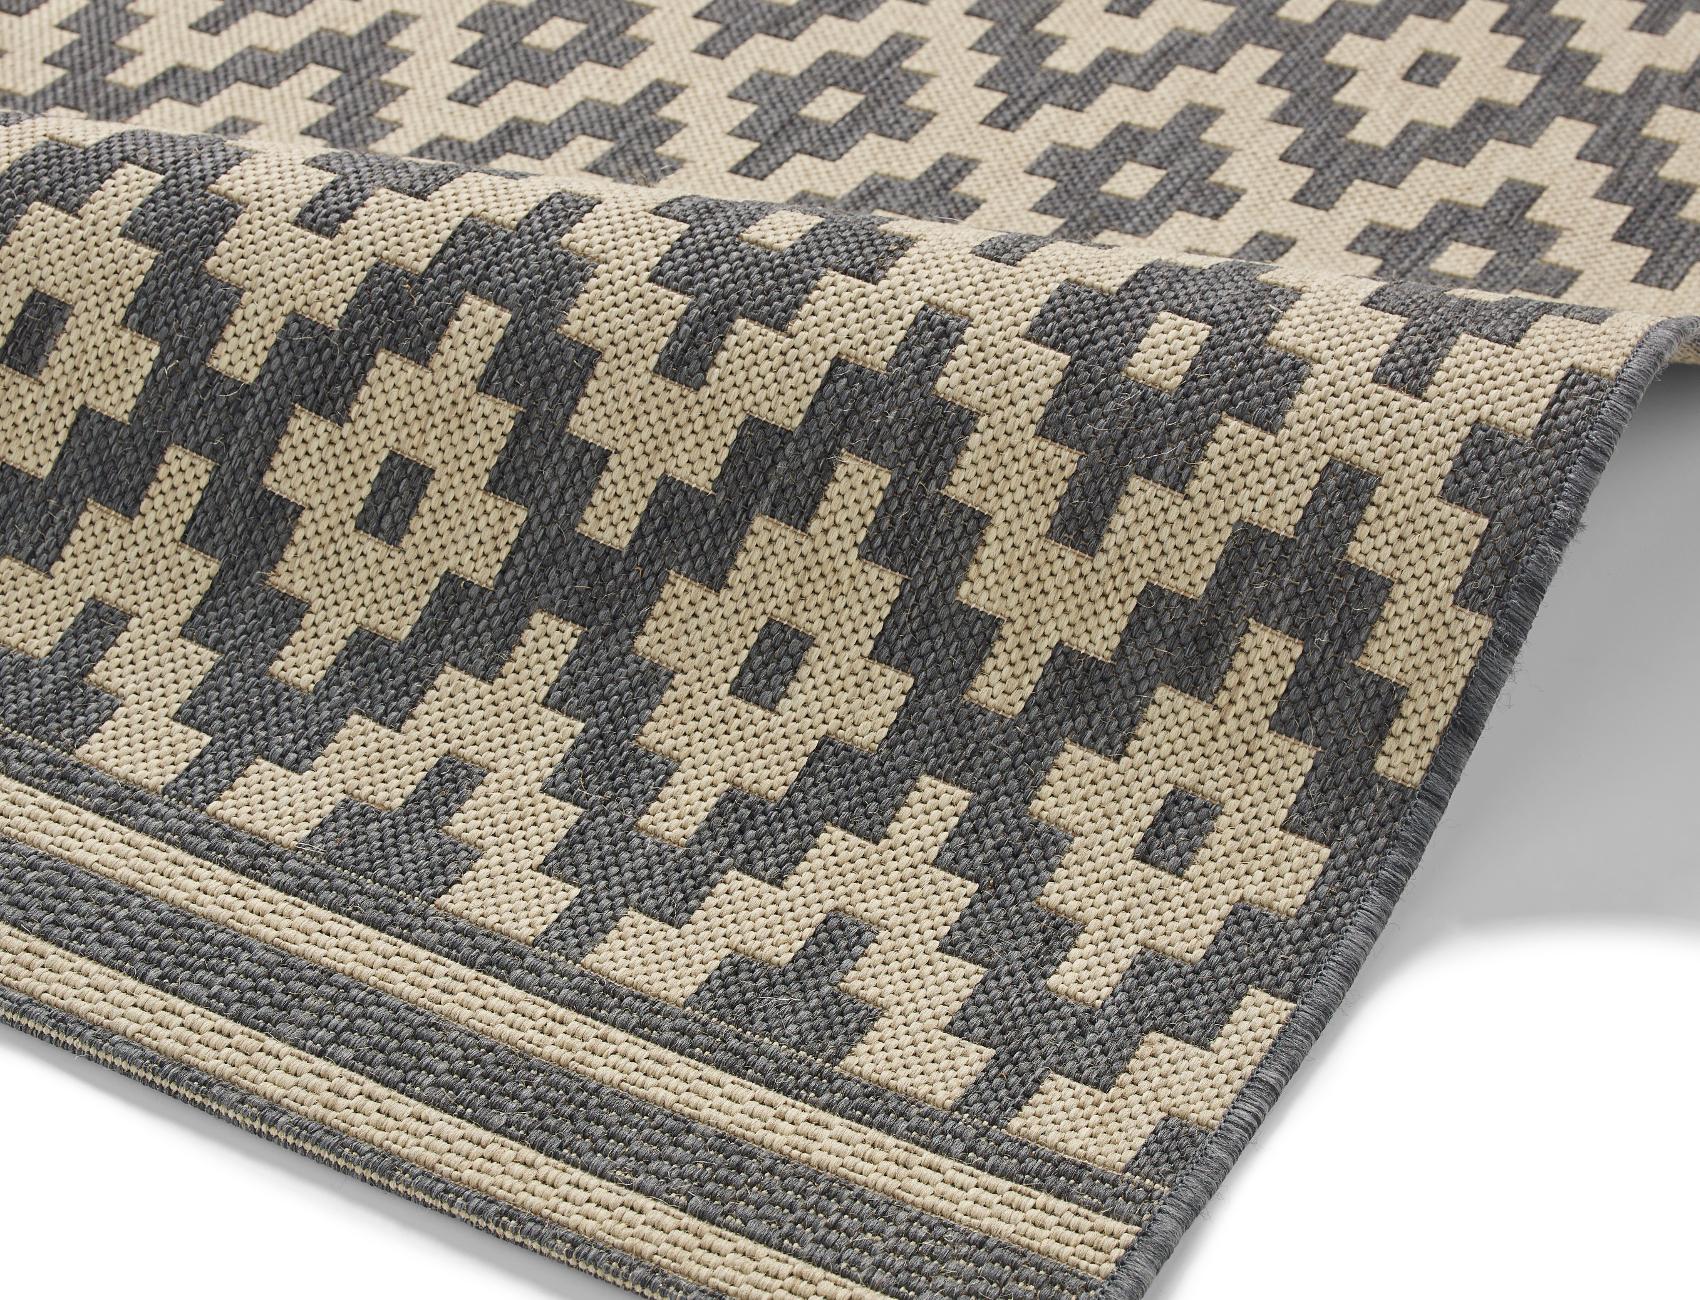 Cottage Diamond Rug Machine Made Flat Weave Polypropylene Durable